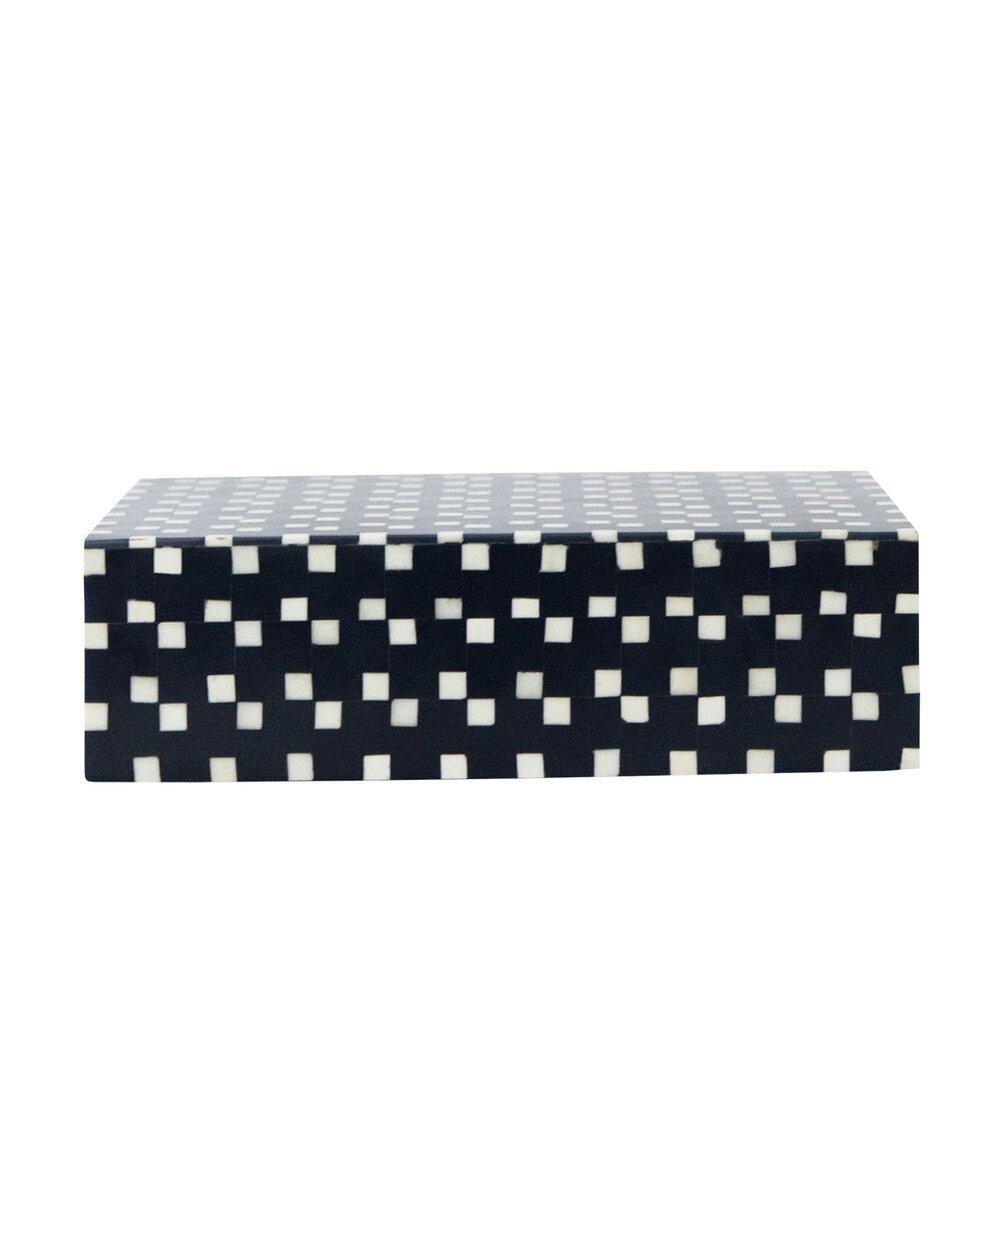 HexagonPatternedBox01-1.jpg